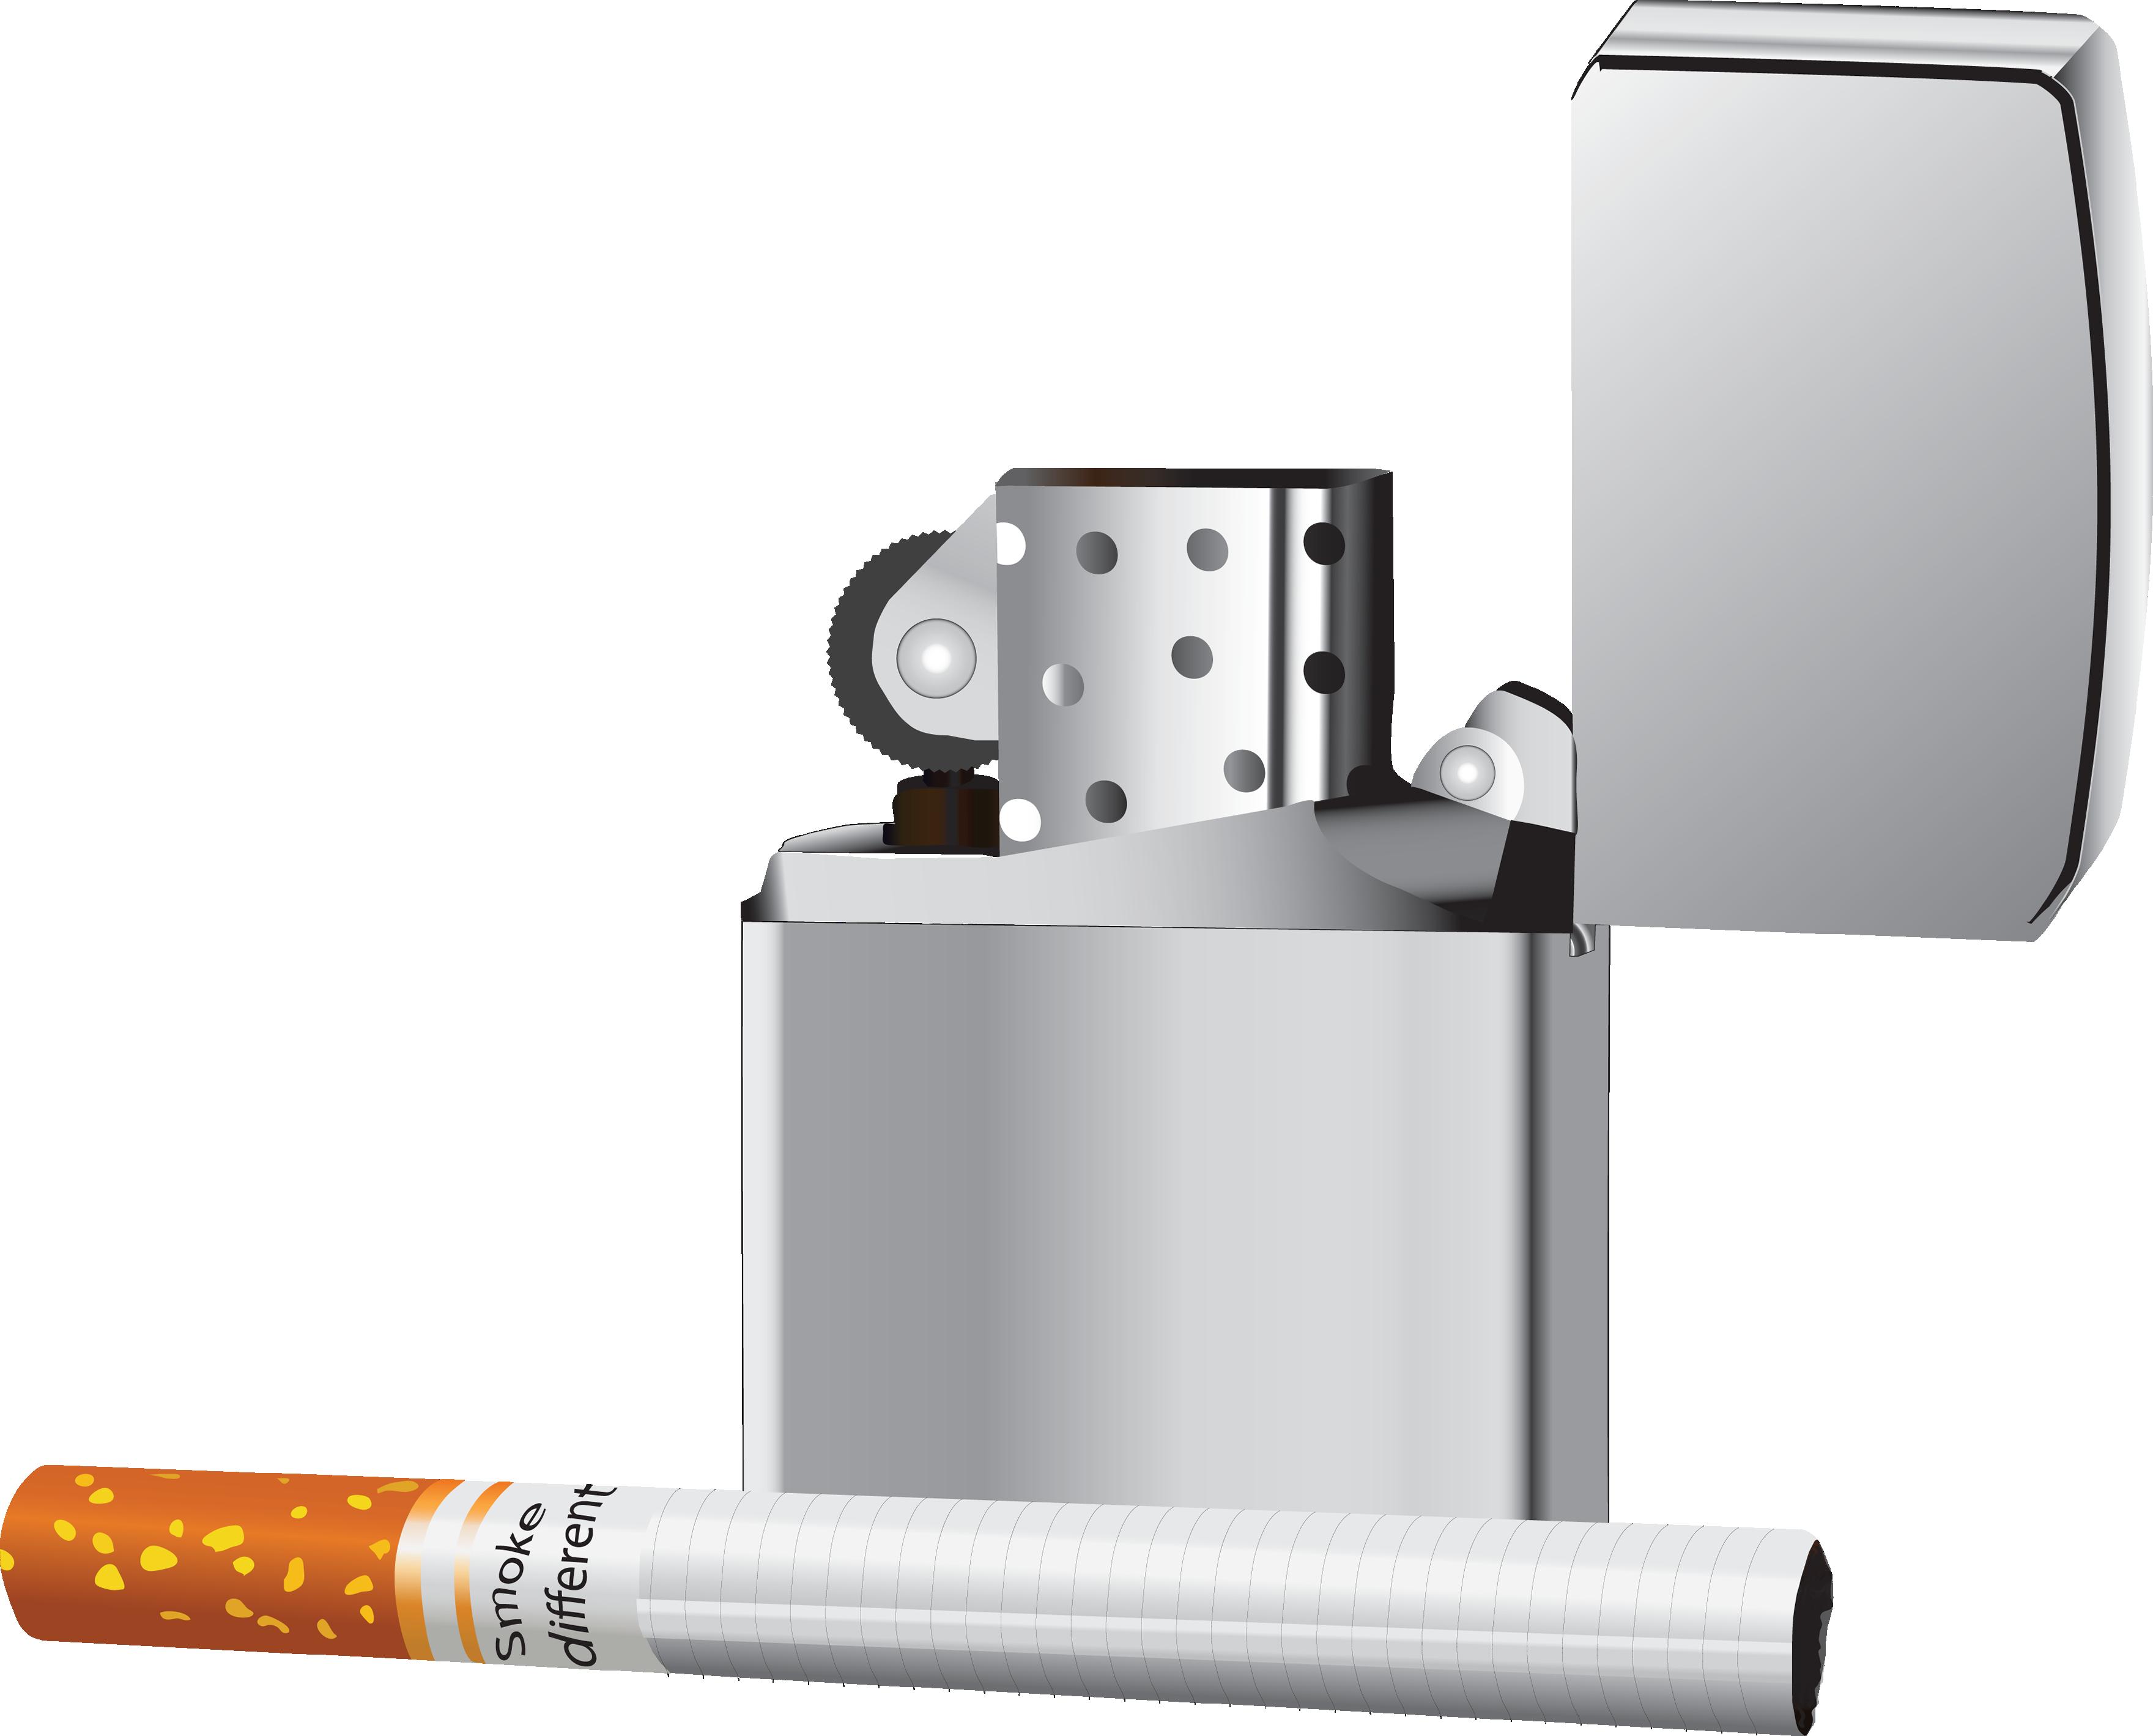 Сигарета PNG фото скачать